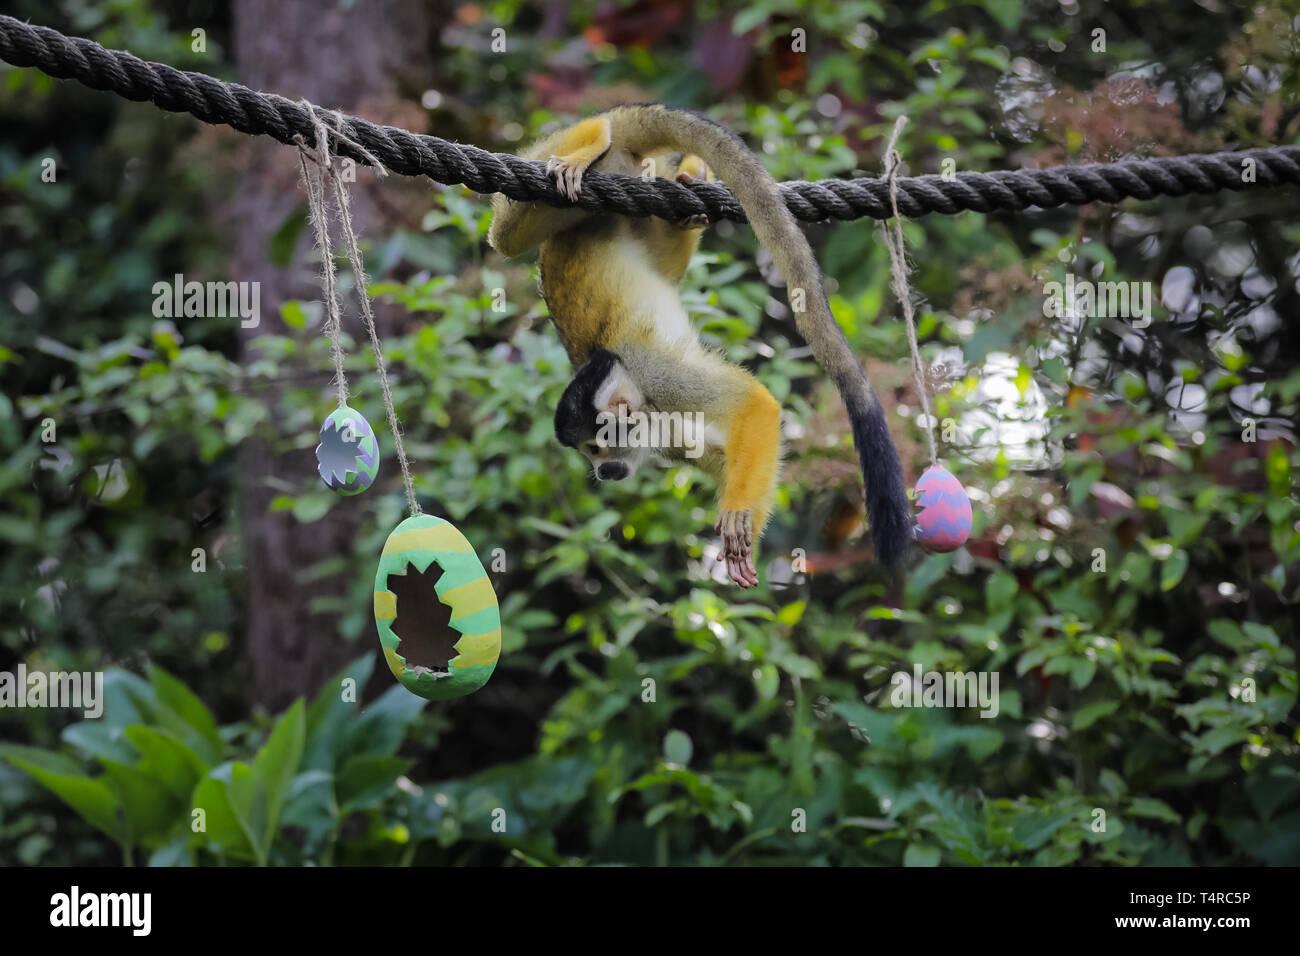 Christbaumkugeln Pappmache.Buntes Papiermaché Stockfotos Buntes Papiermaché Bilder Alamy